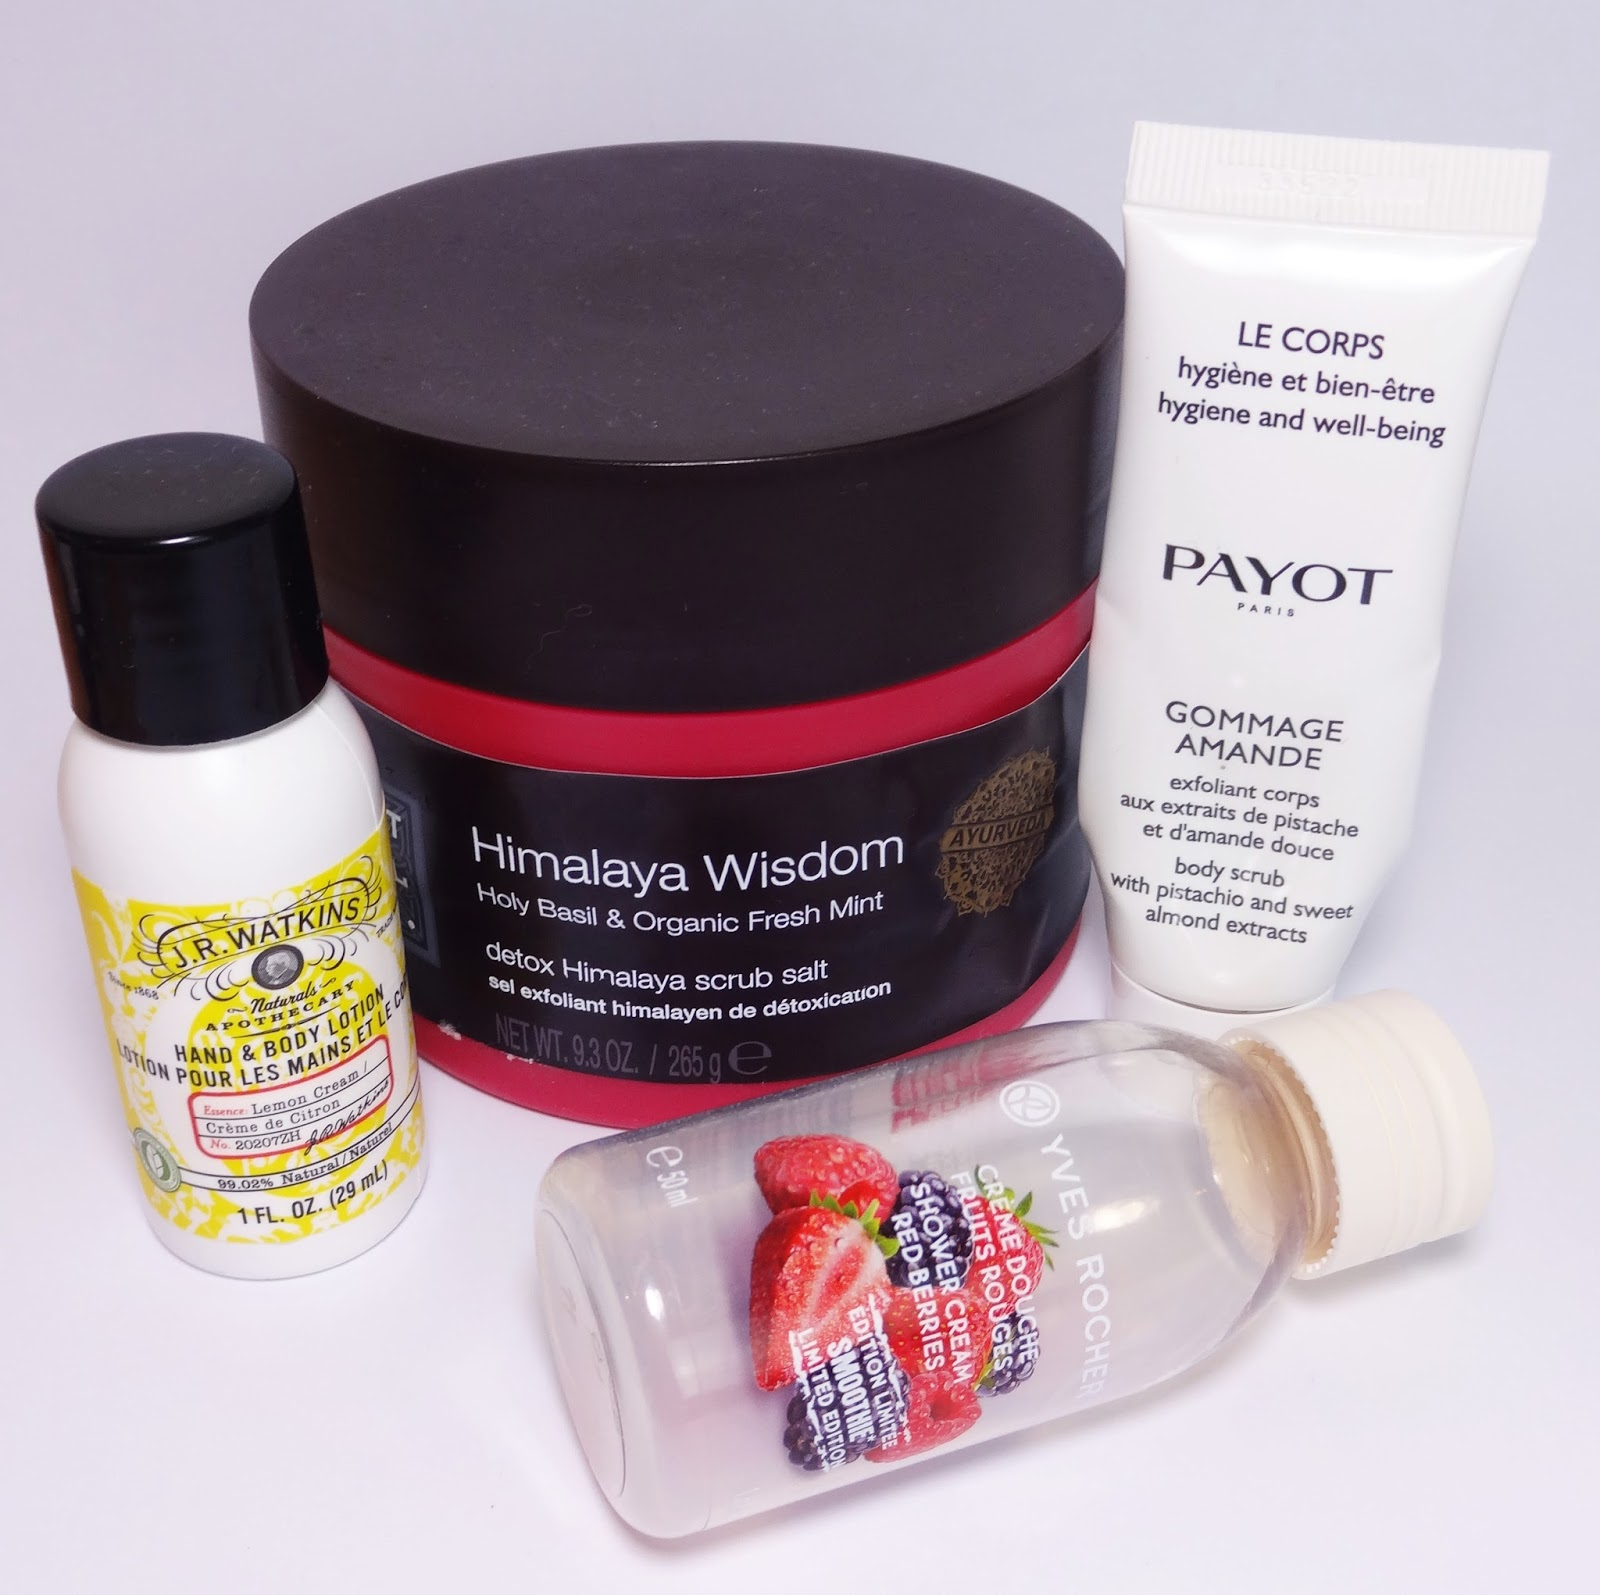 Rituals, Payot, Yves Rocher, J.R. Watkins